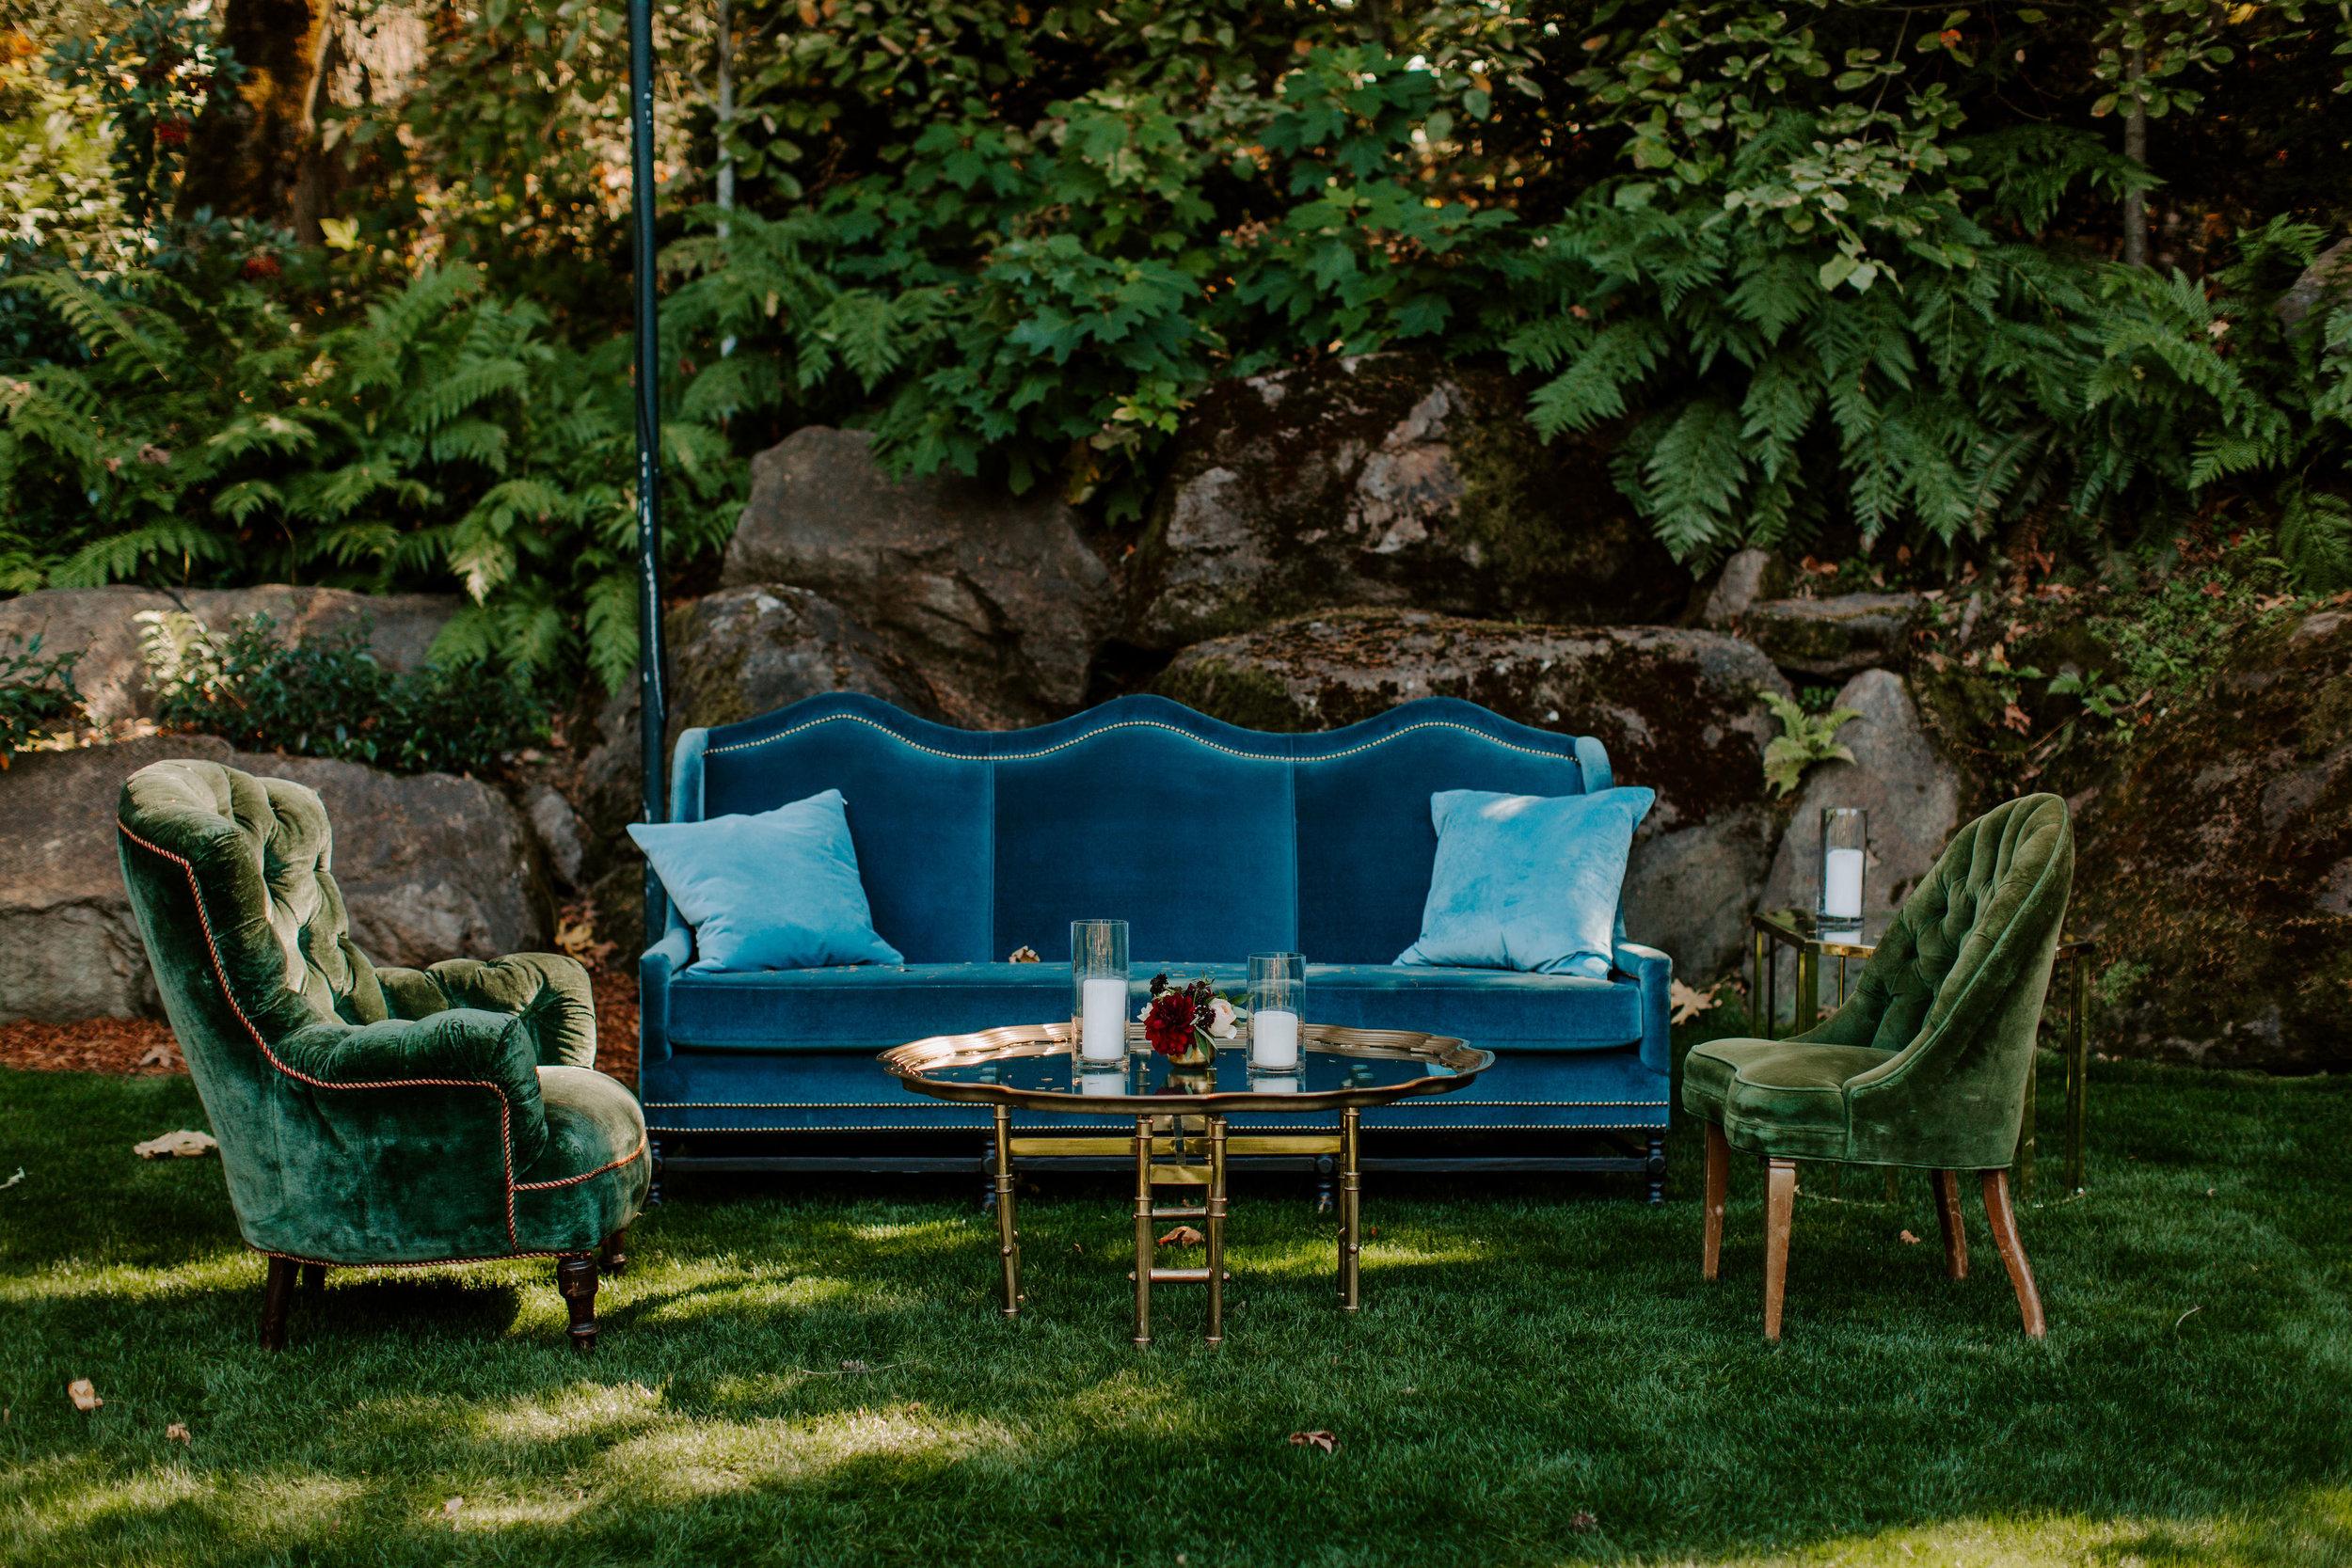 Vintage Lounge Furniture _ROQUE Events_ Taylor Mccutchan3.jpg